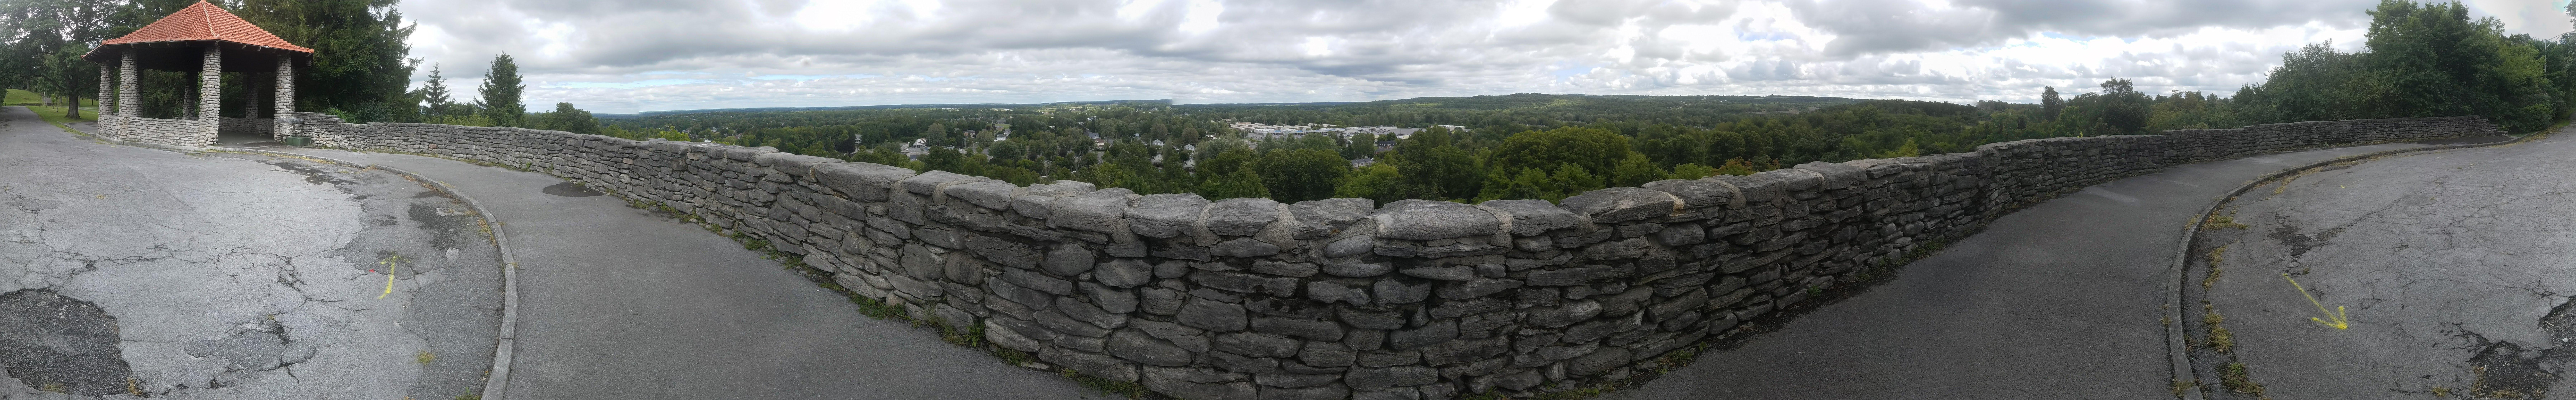 Jefferson County's Thompson Park observation area